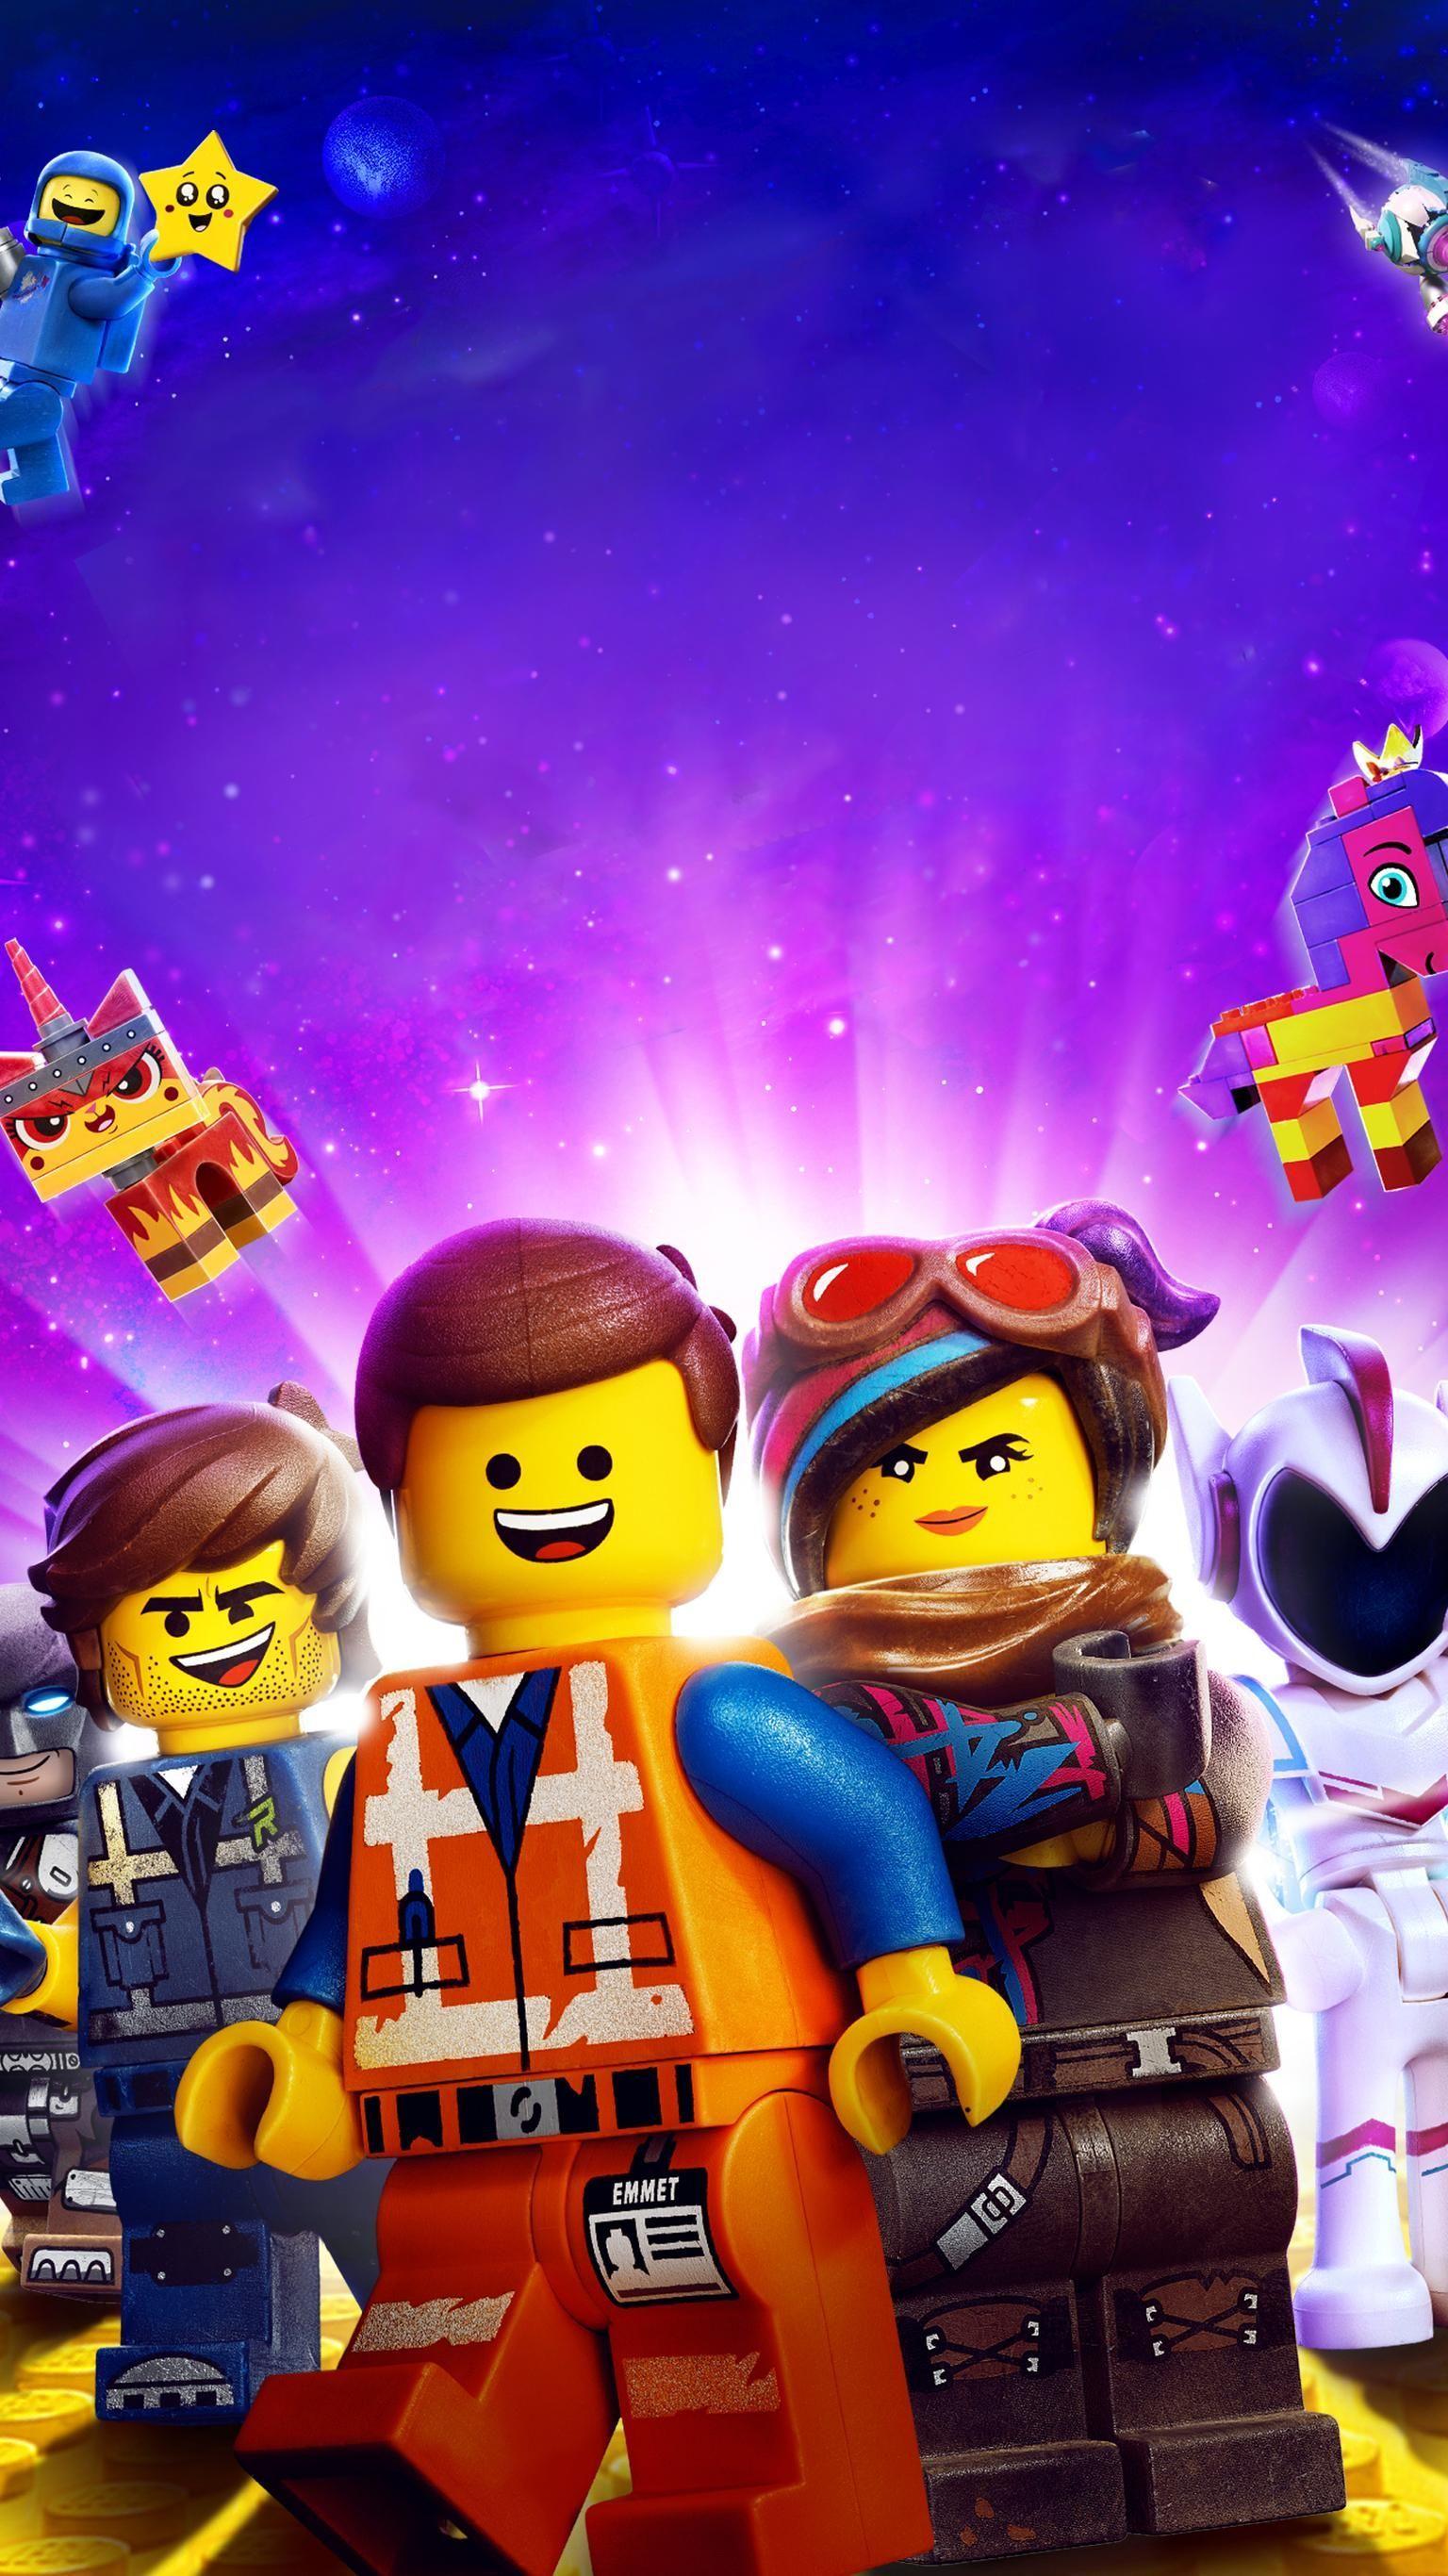 Lego Movie Moviemania Part Phone Wallpaper The Lego Movie 2 The Second Part 2019 Phone Wallpaper Moviemani In 2020 Lego Wallpaper Animated Gift Lego Movie 2